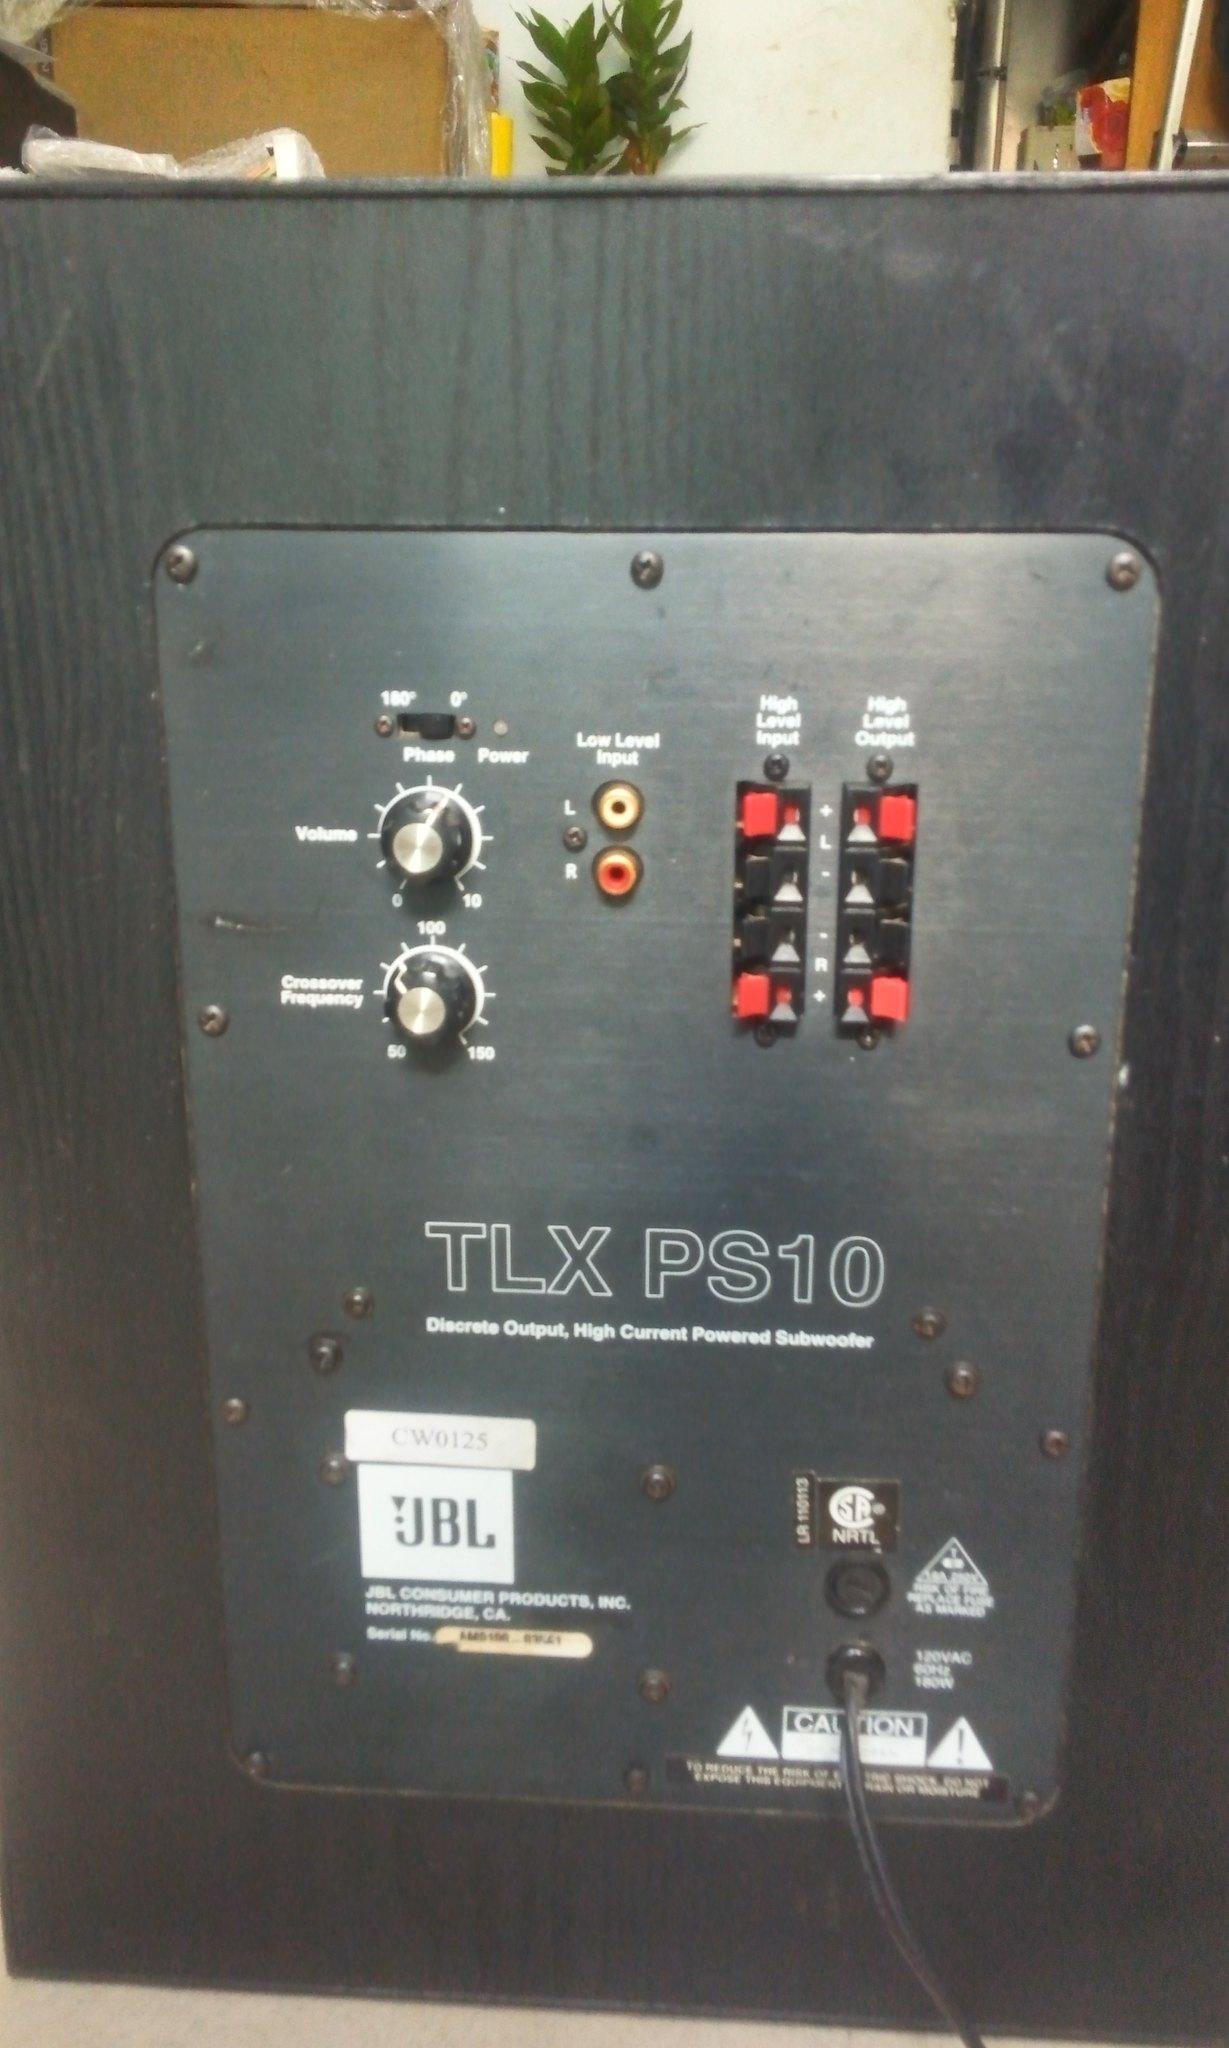 NHO AUDIO-Chuyên loa sub điện -ampli -loa  mỹ -anh - 37